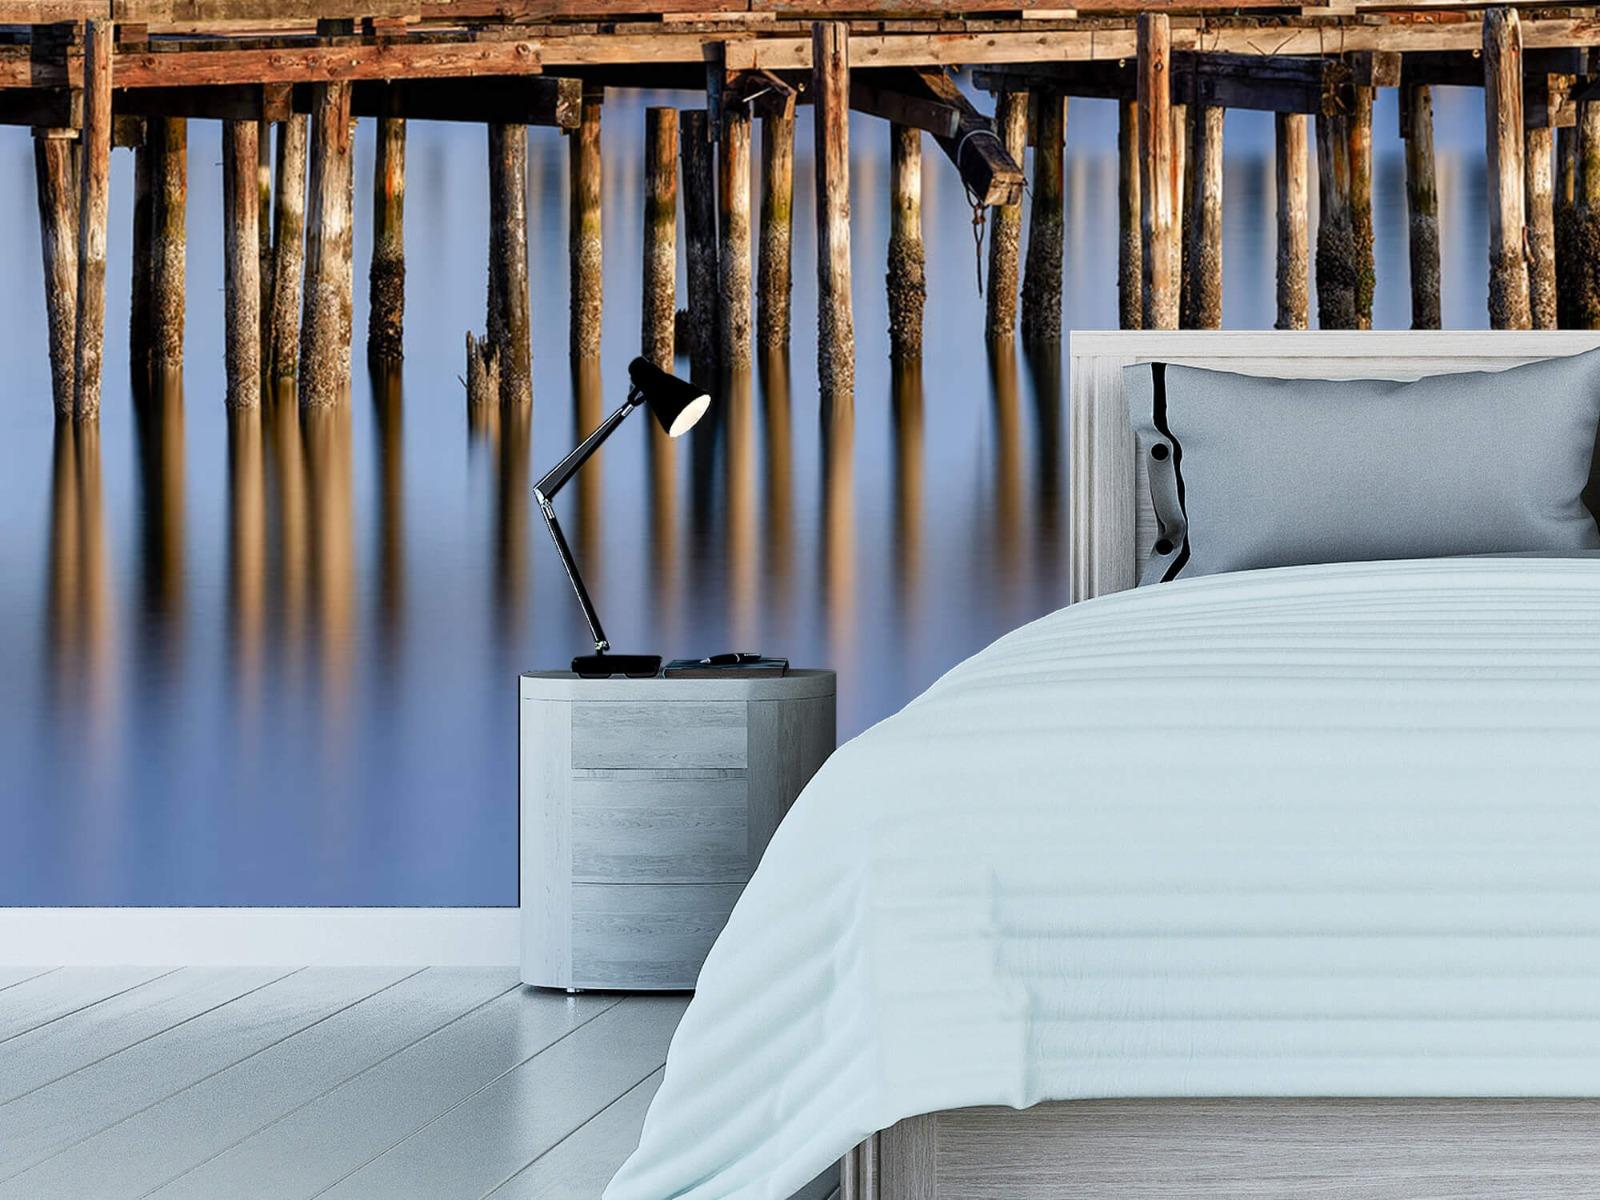 Houten Steigers - Steiger op houten palen - Wallexclusive - Slaapkamer 13